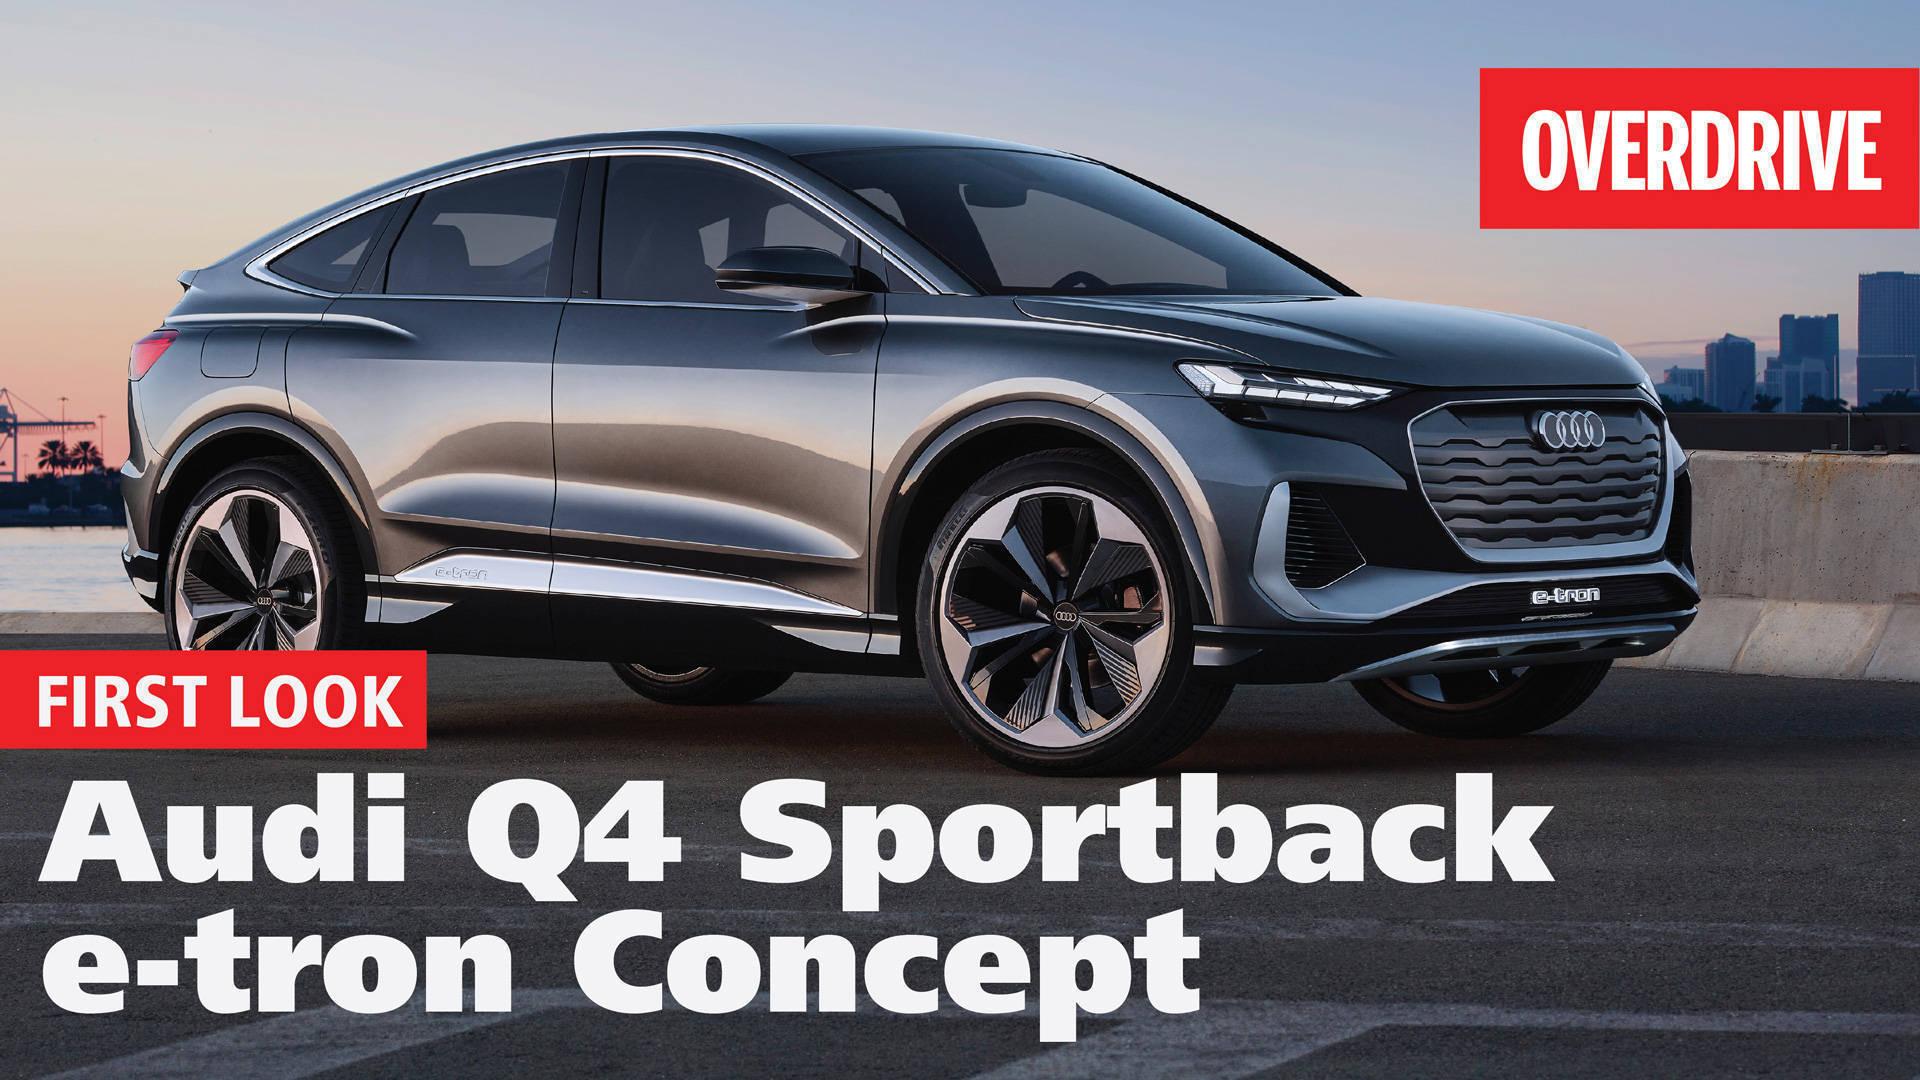 2020 Audi Q4 Sportback e-tron concept | First Look